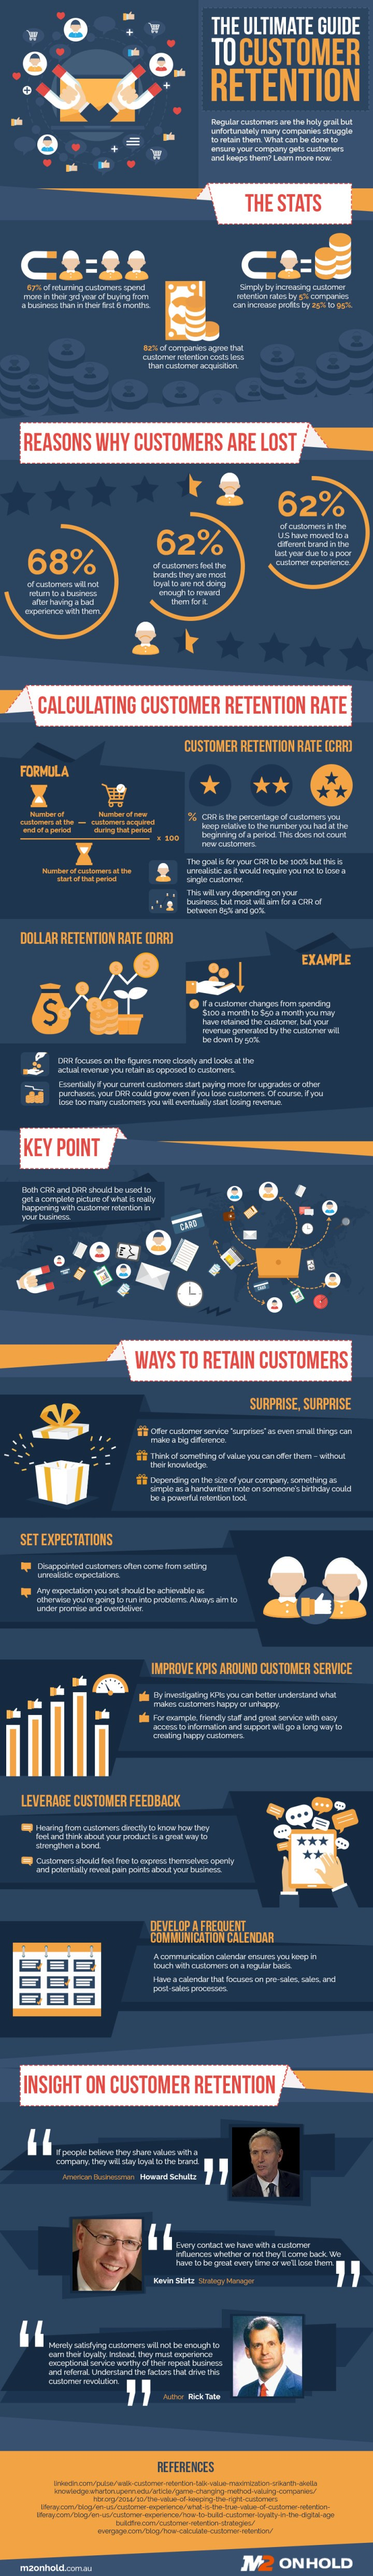 Better Retaining Customers